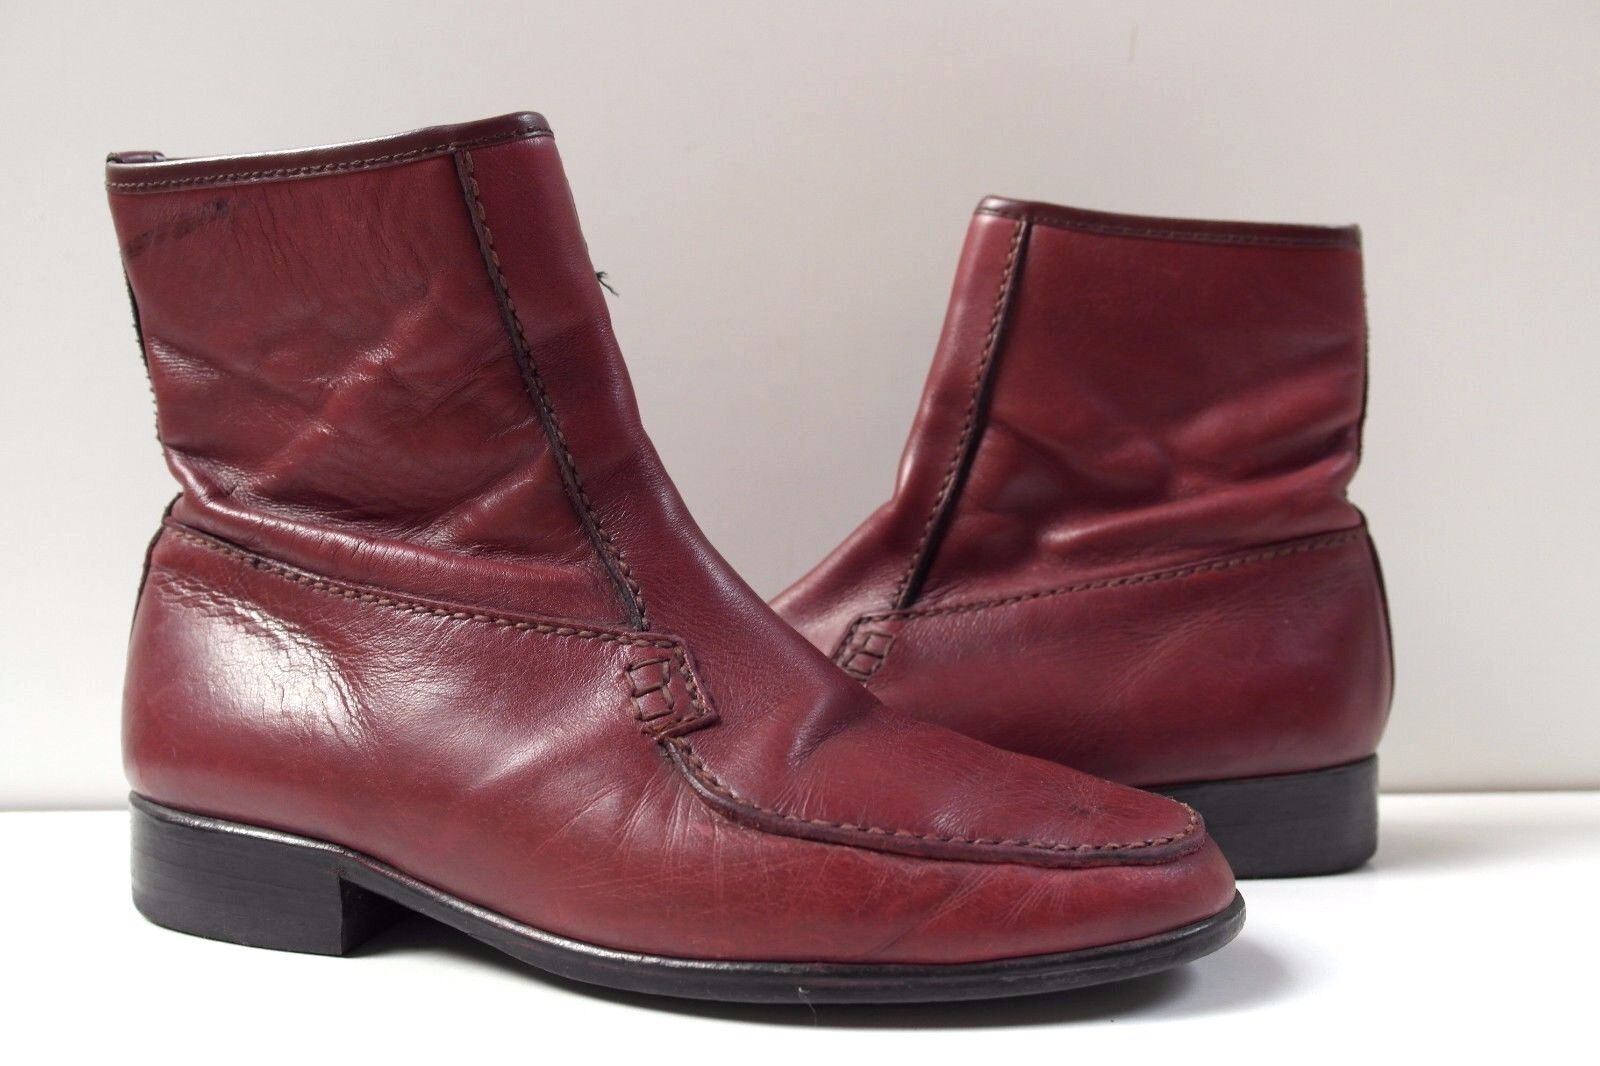 TRUE VINTAGE Stiefelette Herren Schuhe Stiefel Ankle Stiefel UK 7 bordeaux Booties